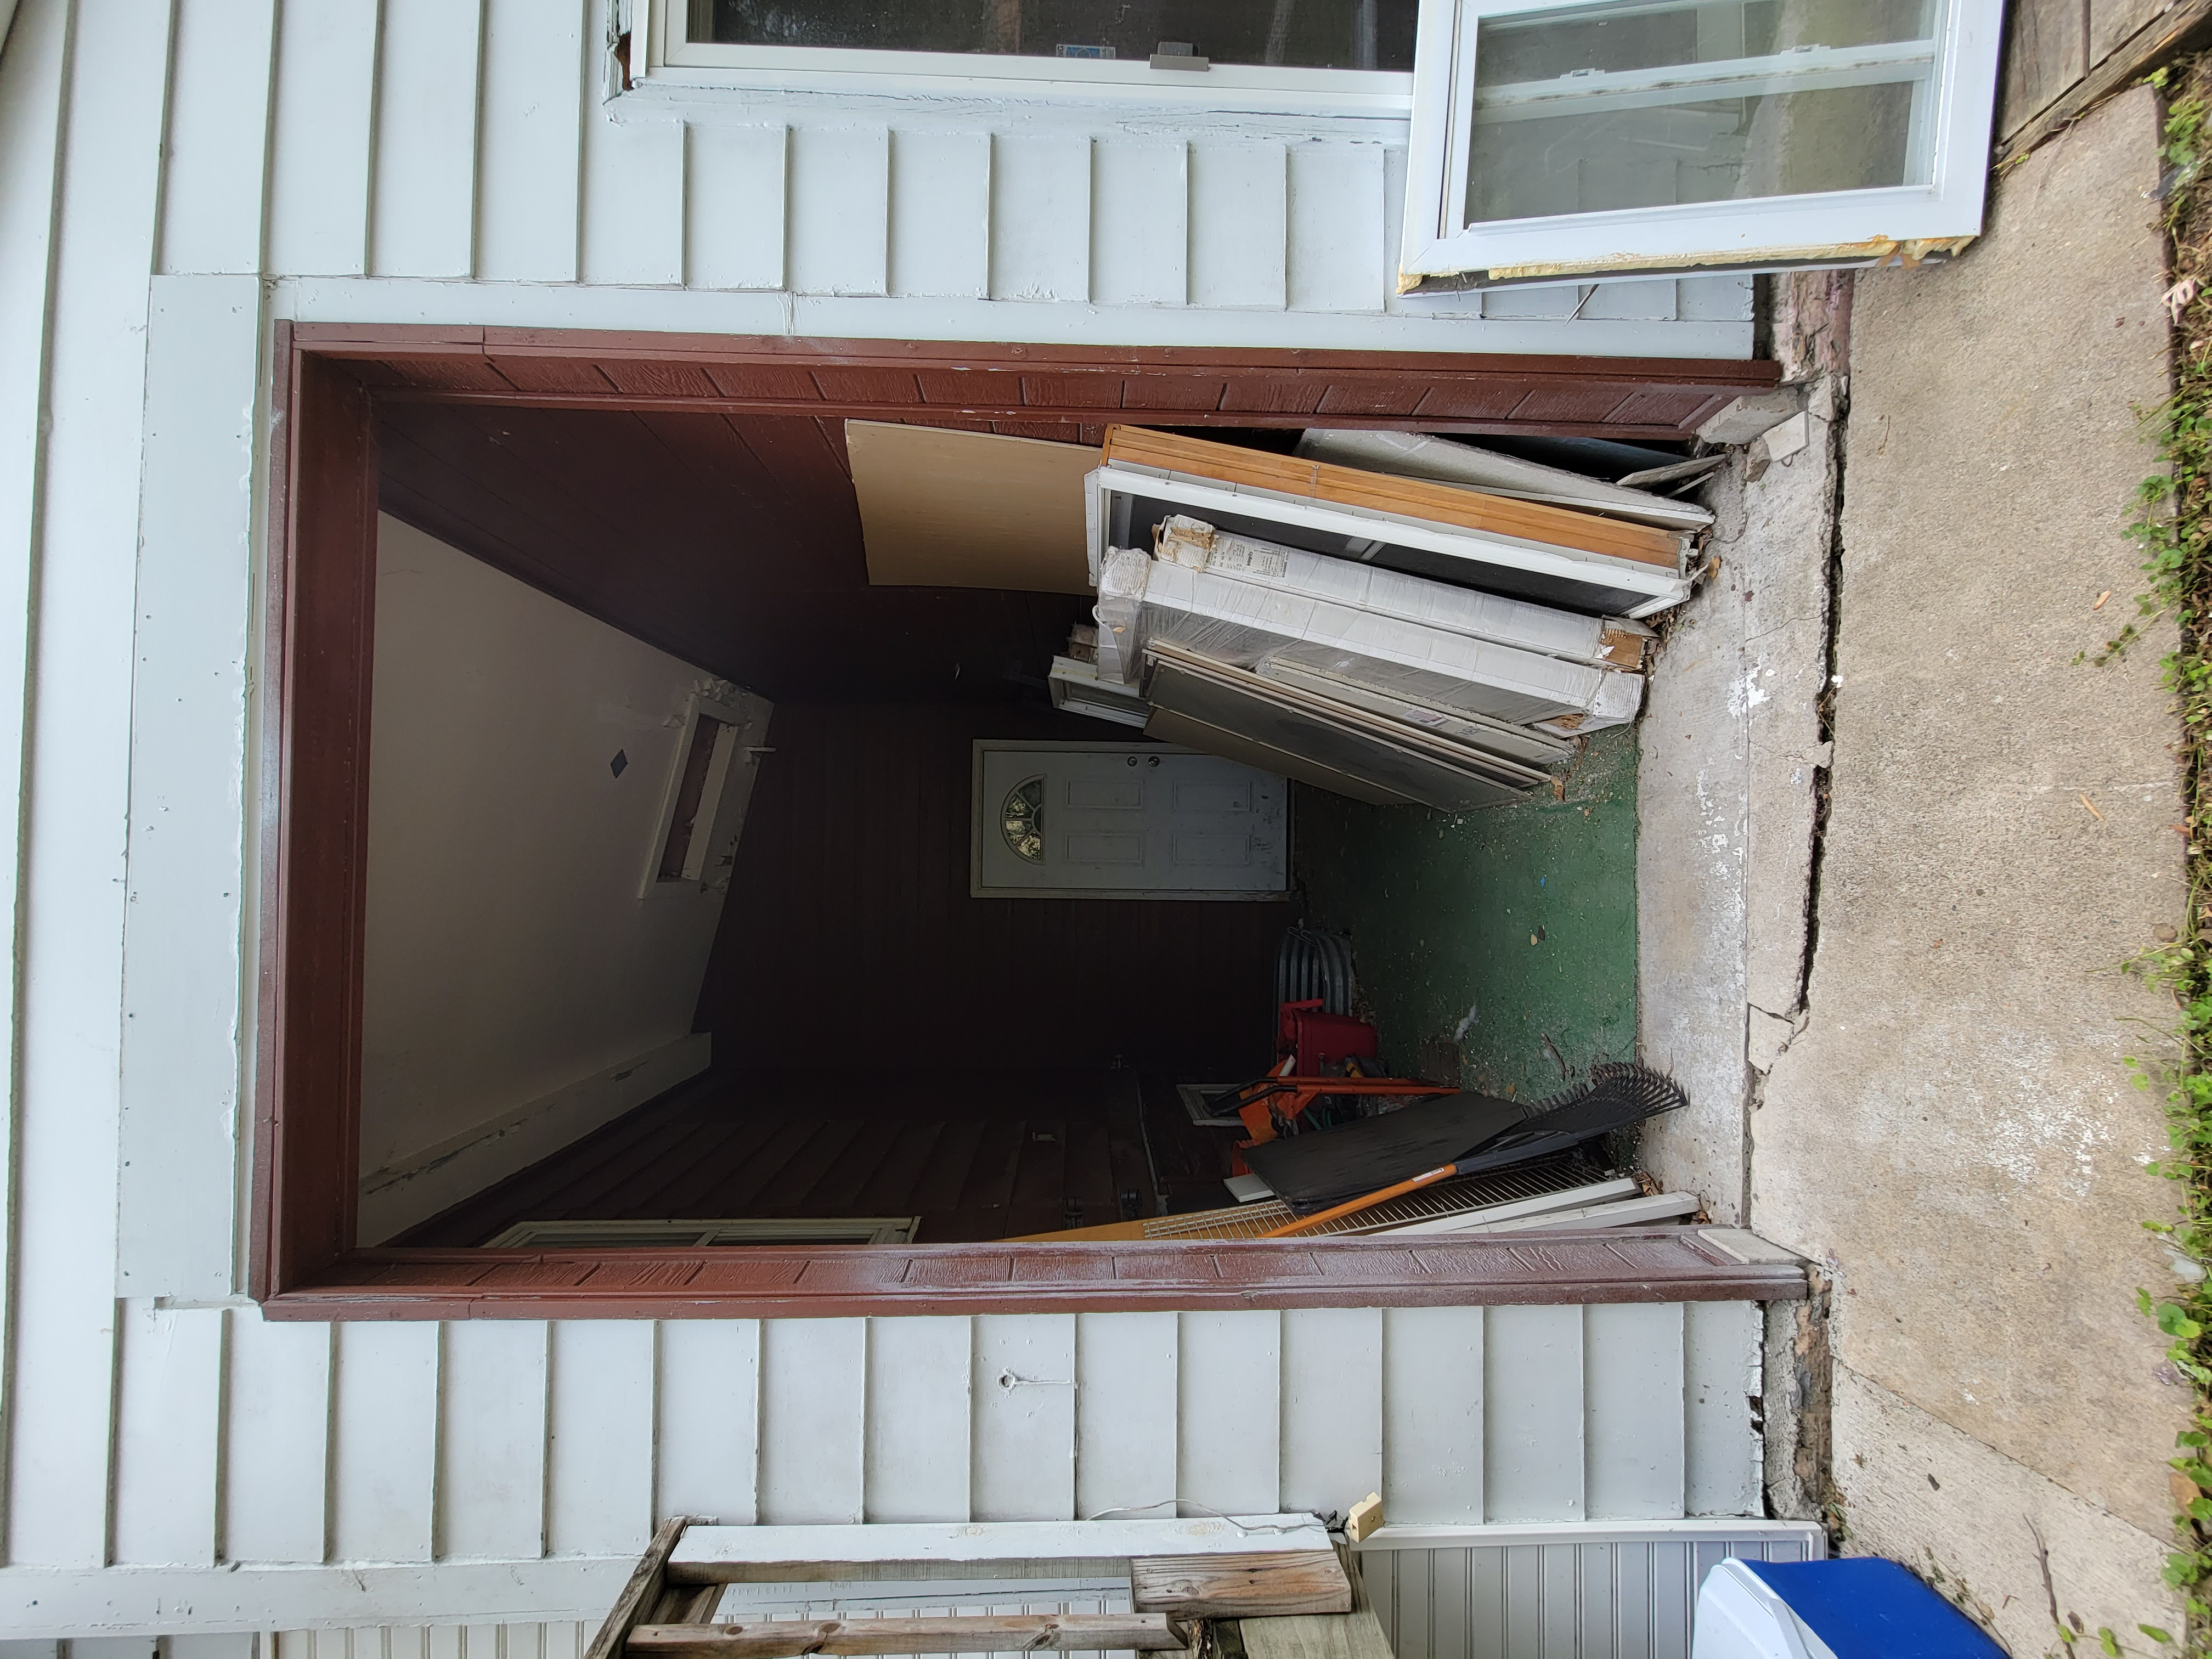 205 - Storage-Pool Entrance